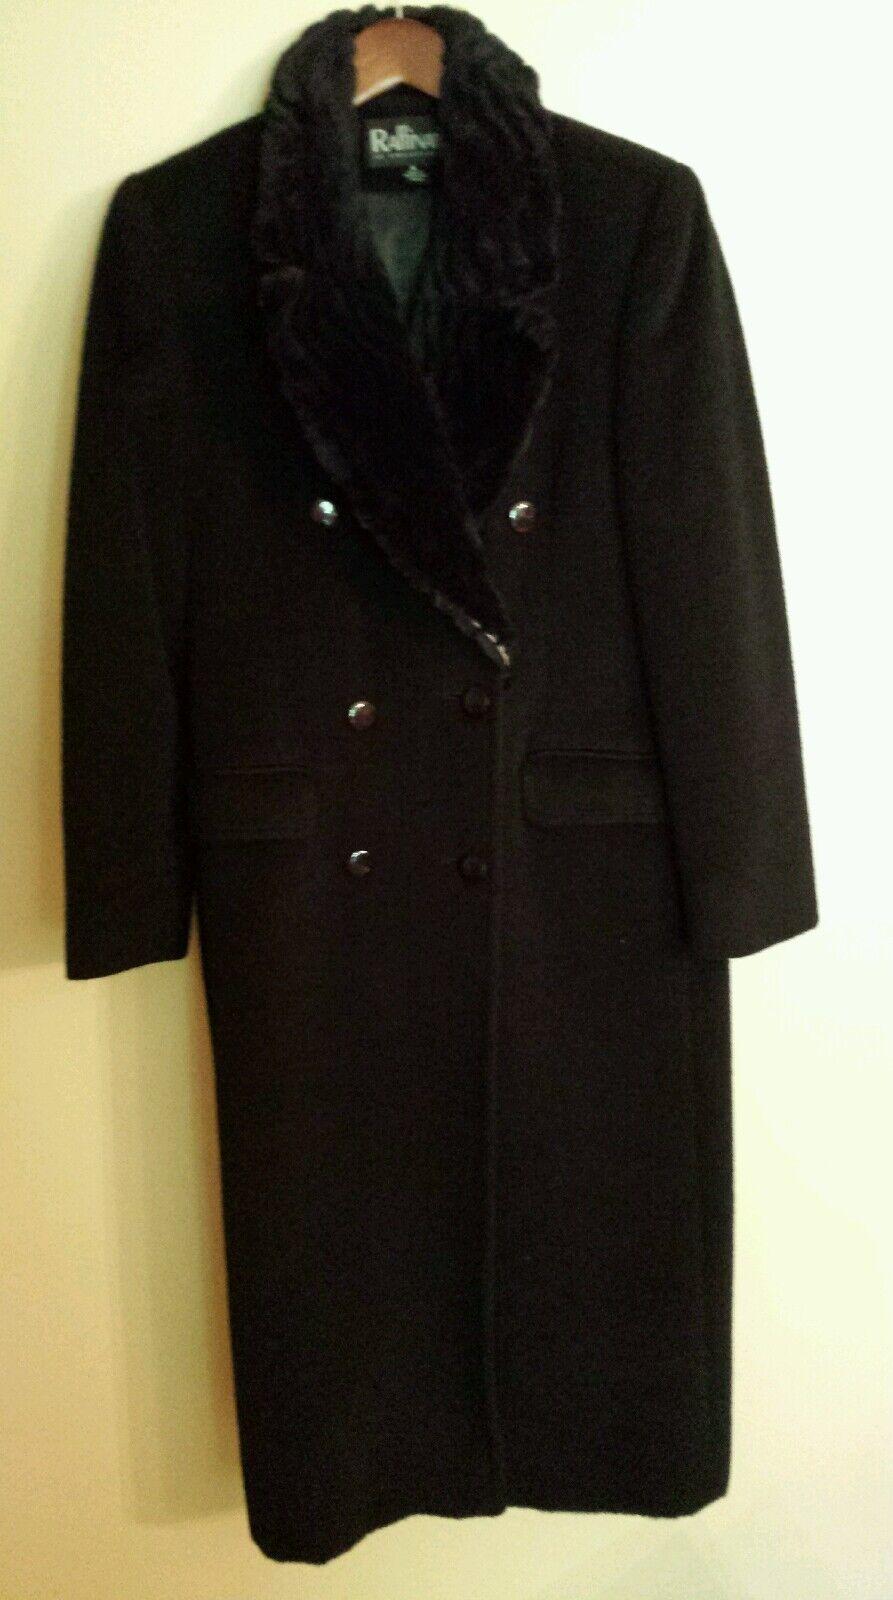 Raffinati womens coat size 6 alpaca wool with sheared fur